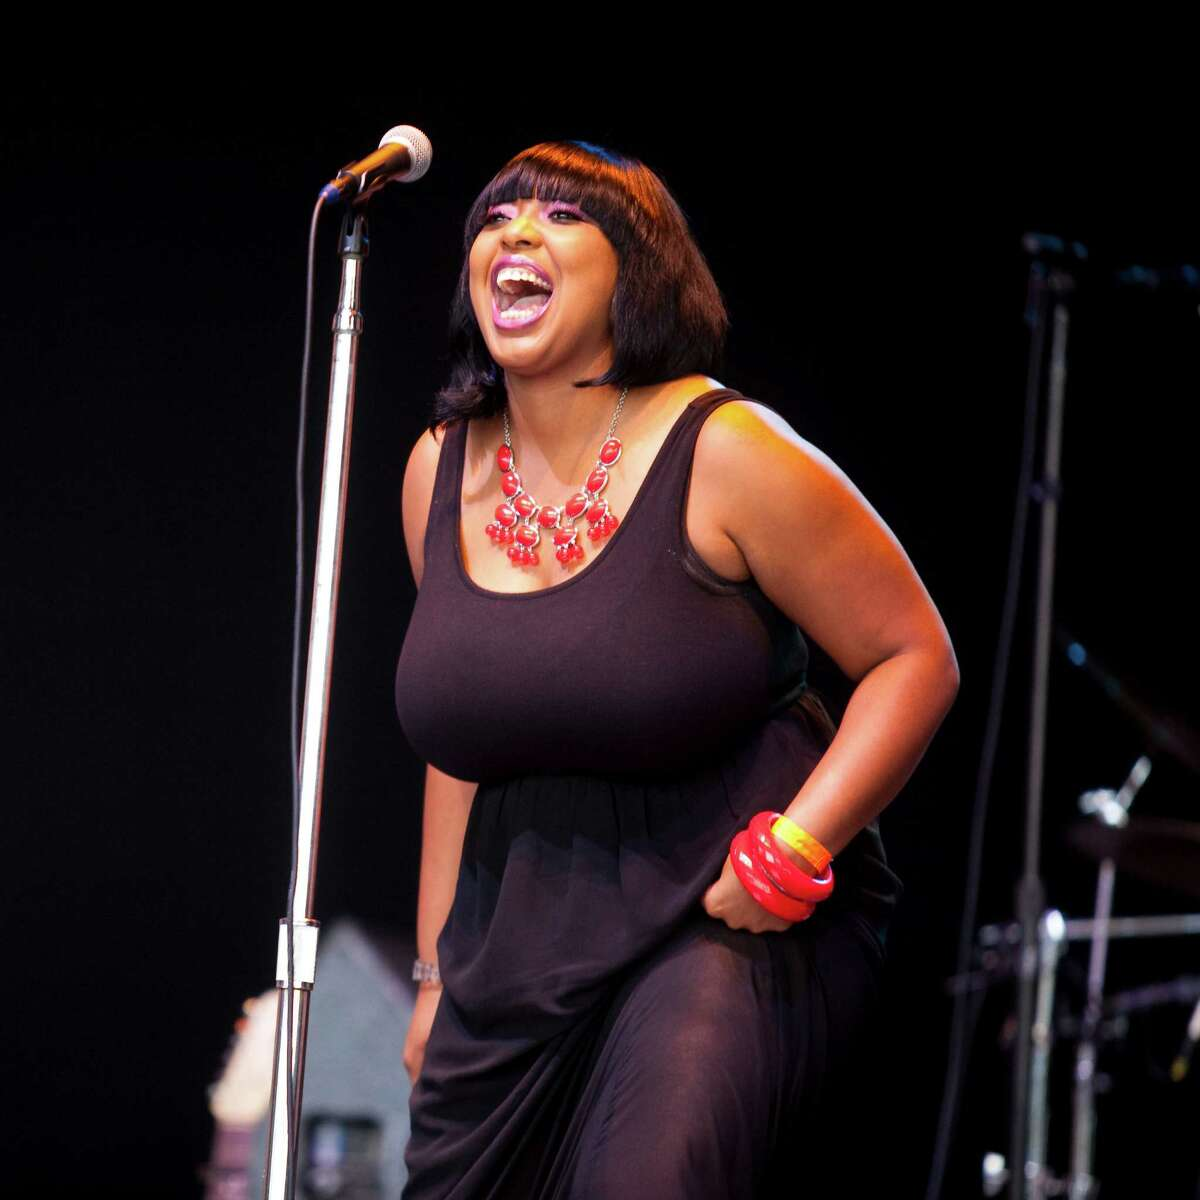 Blues singer Annika Chambers